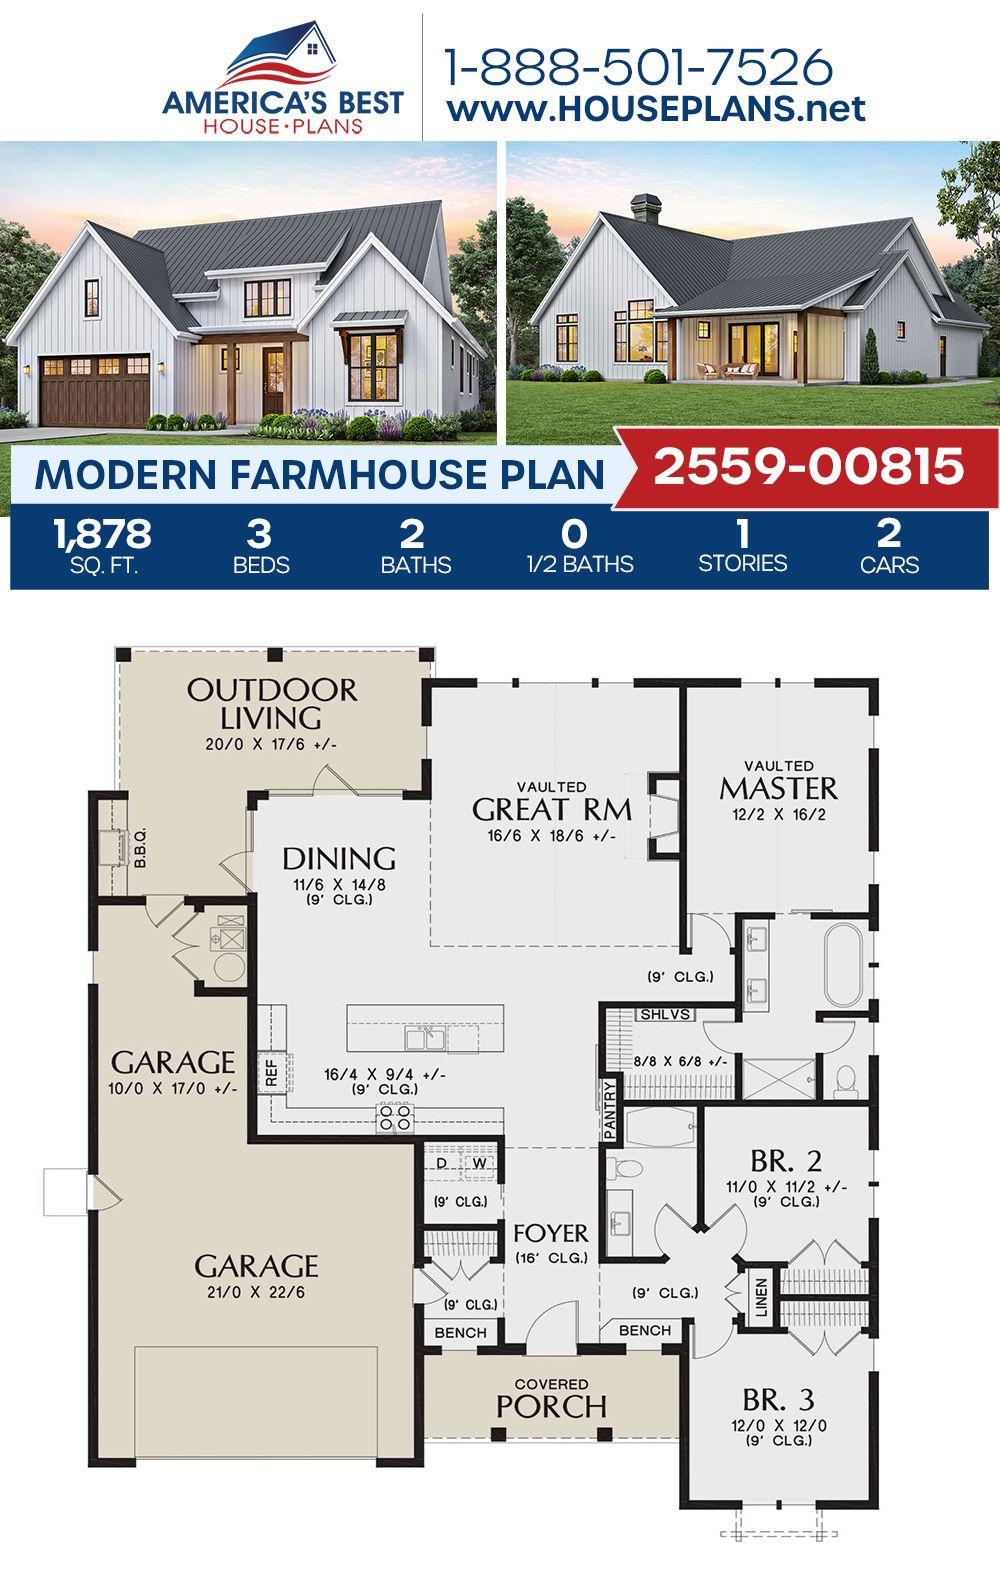 House Plan 2559 00815 Modern Farmhouse Plan 1 878 Square Feet 3 Bedrooms 2 Bathrooms Modern Farmhouse Plans Farmhouse Plans House Plans Farmhouse